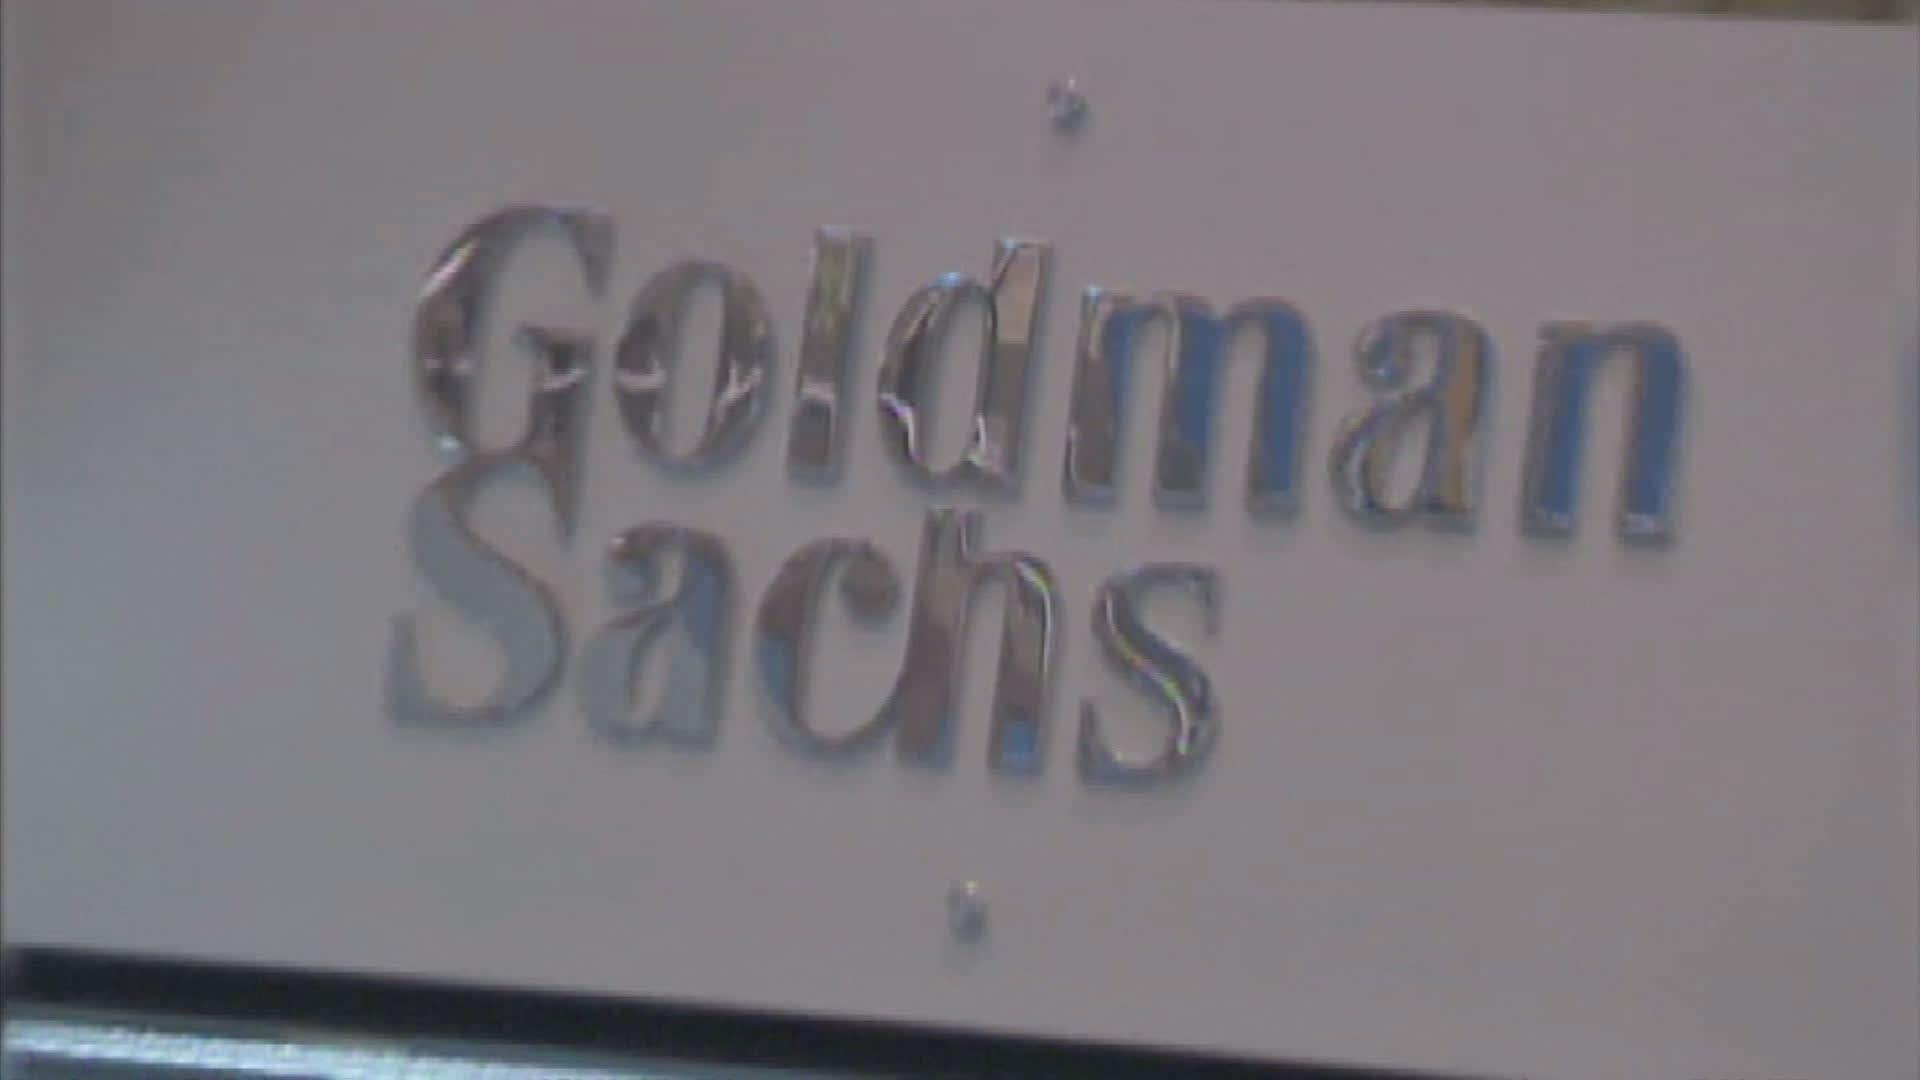 Goldman Sachs is redefining itself